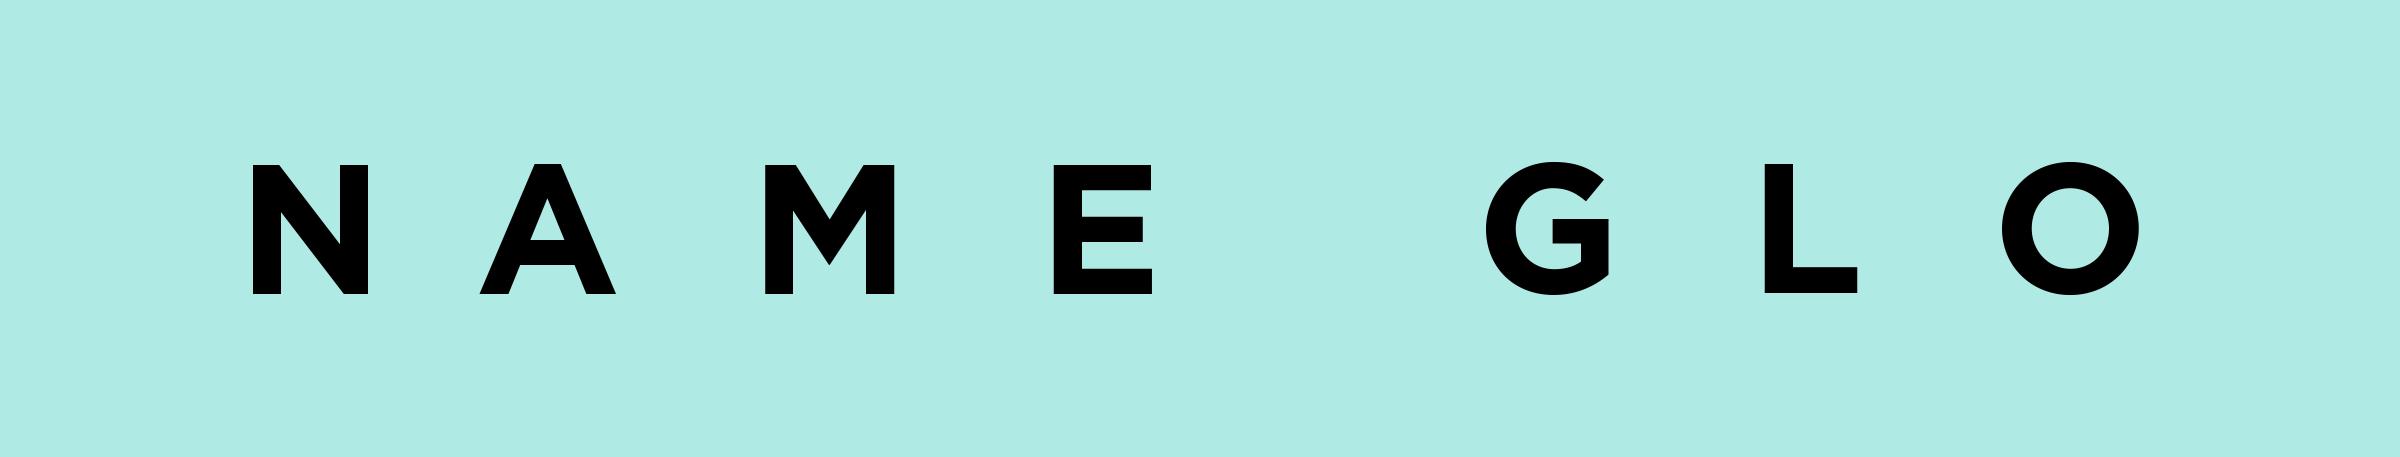 Nameglo-HOME_logo-black.png